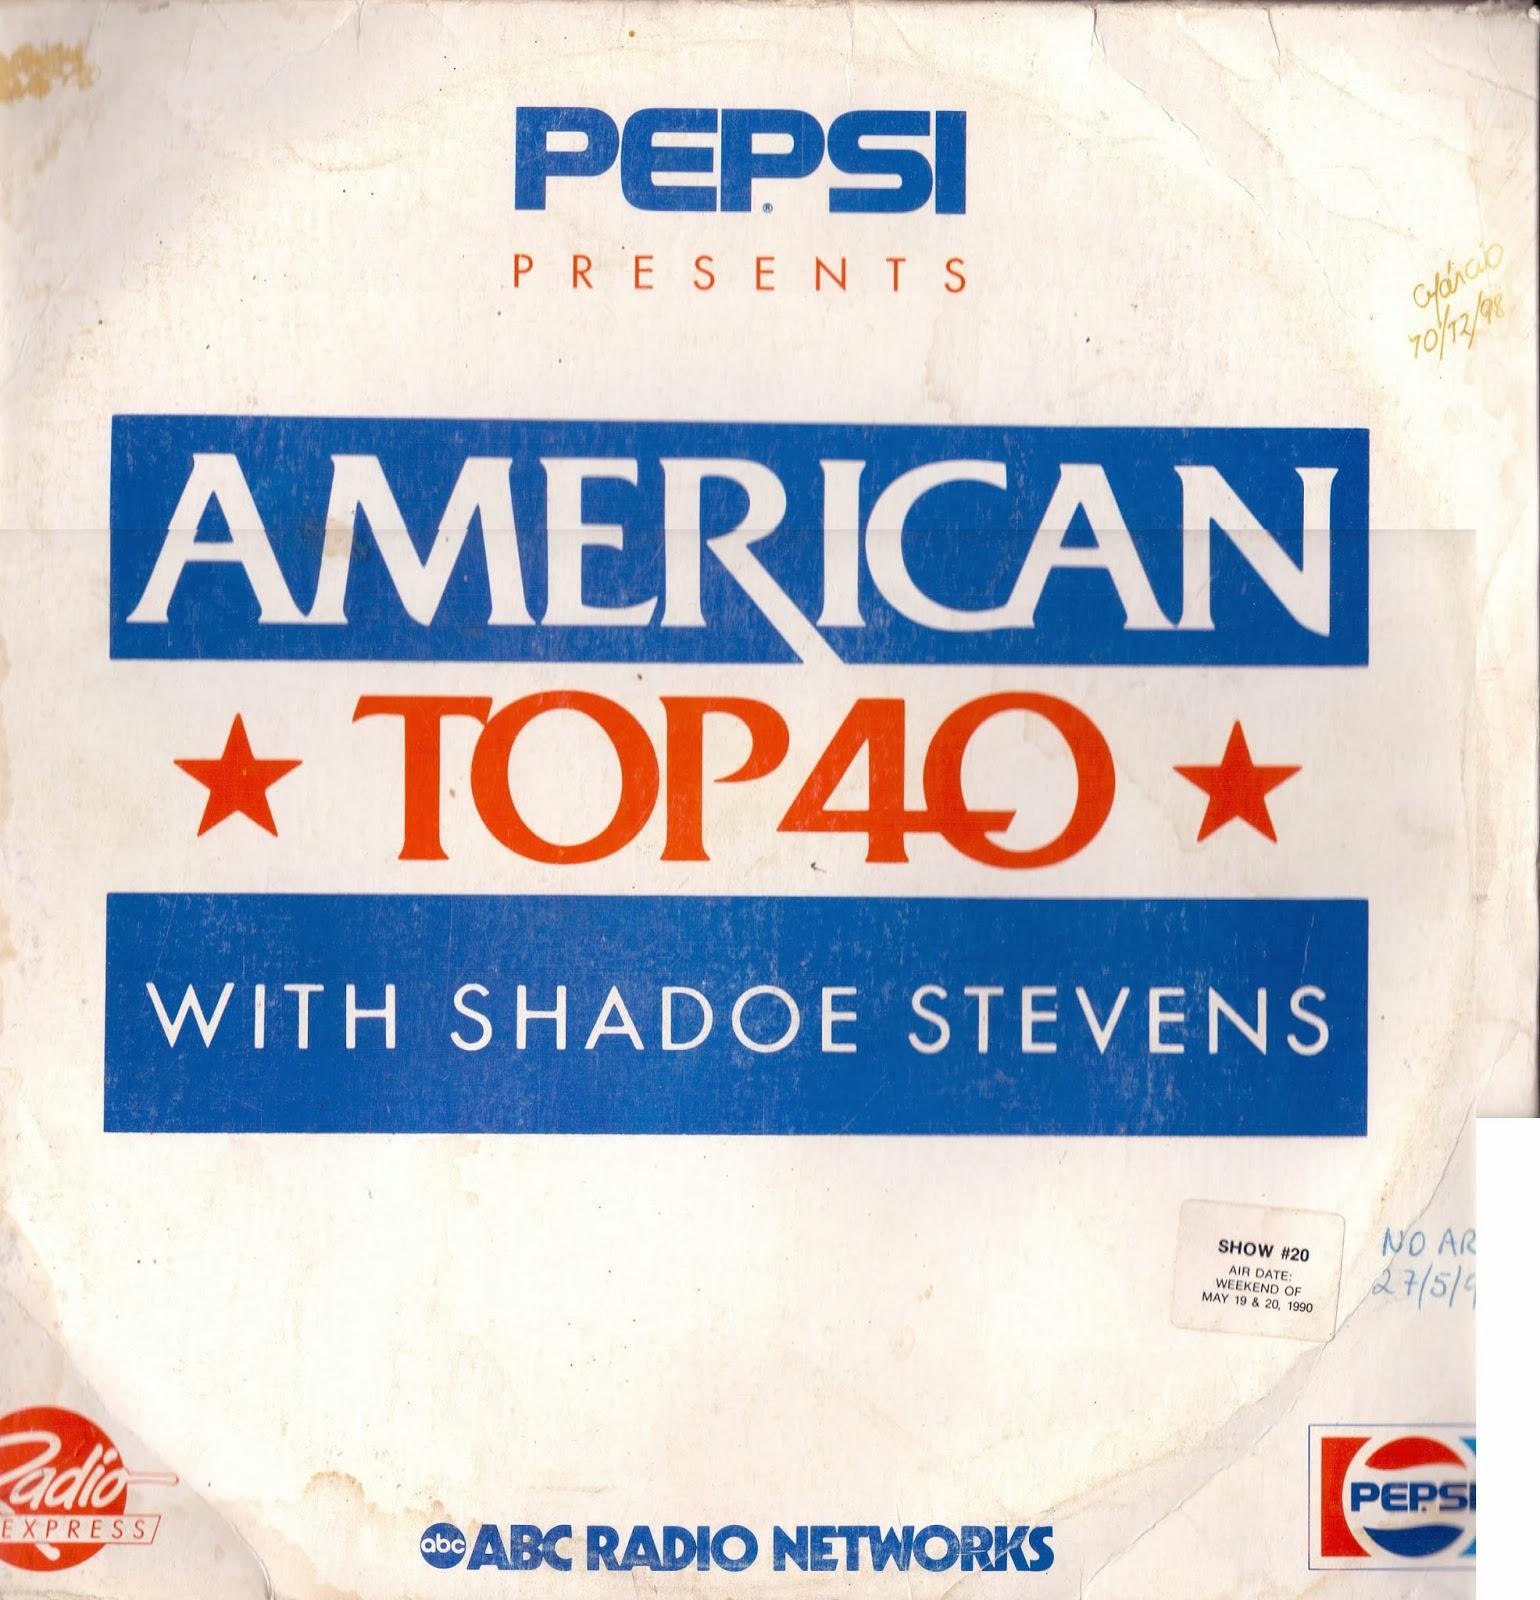 DISCO GIRLS FLASH BACK American Top 40 With Shadoe Stevens